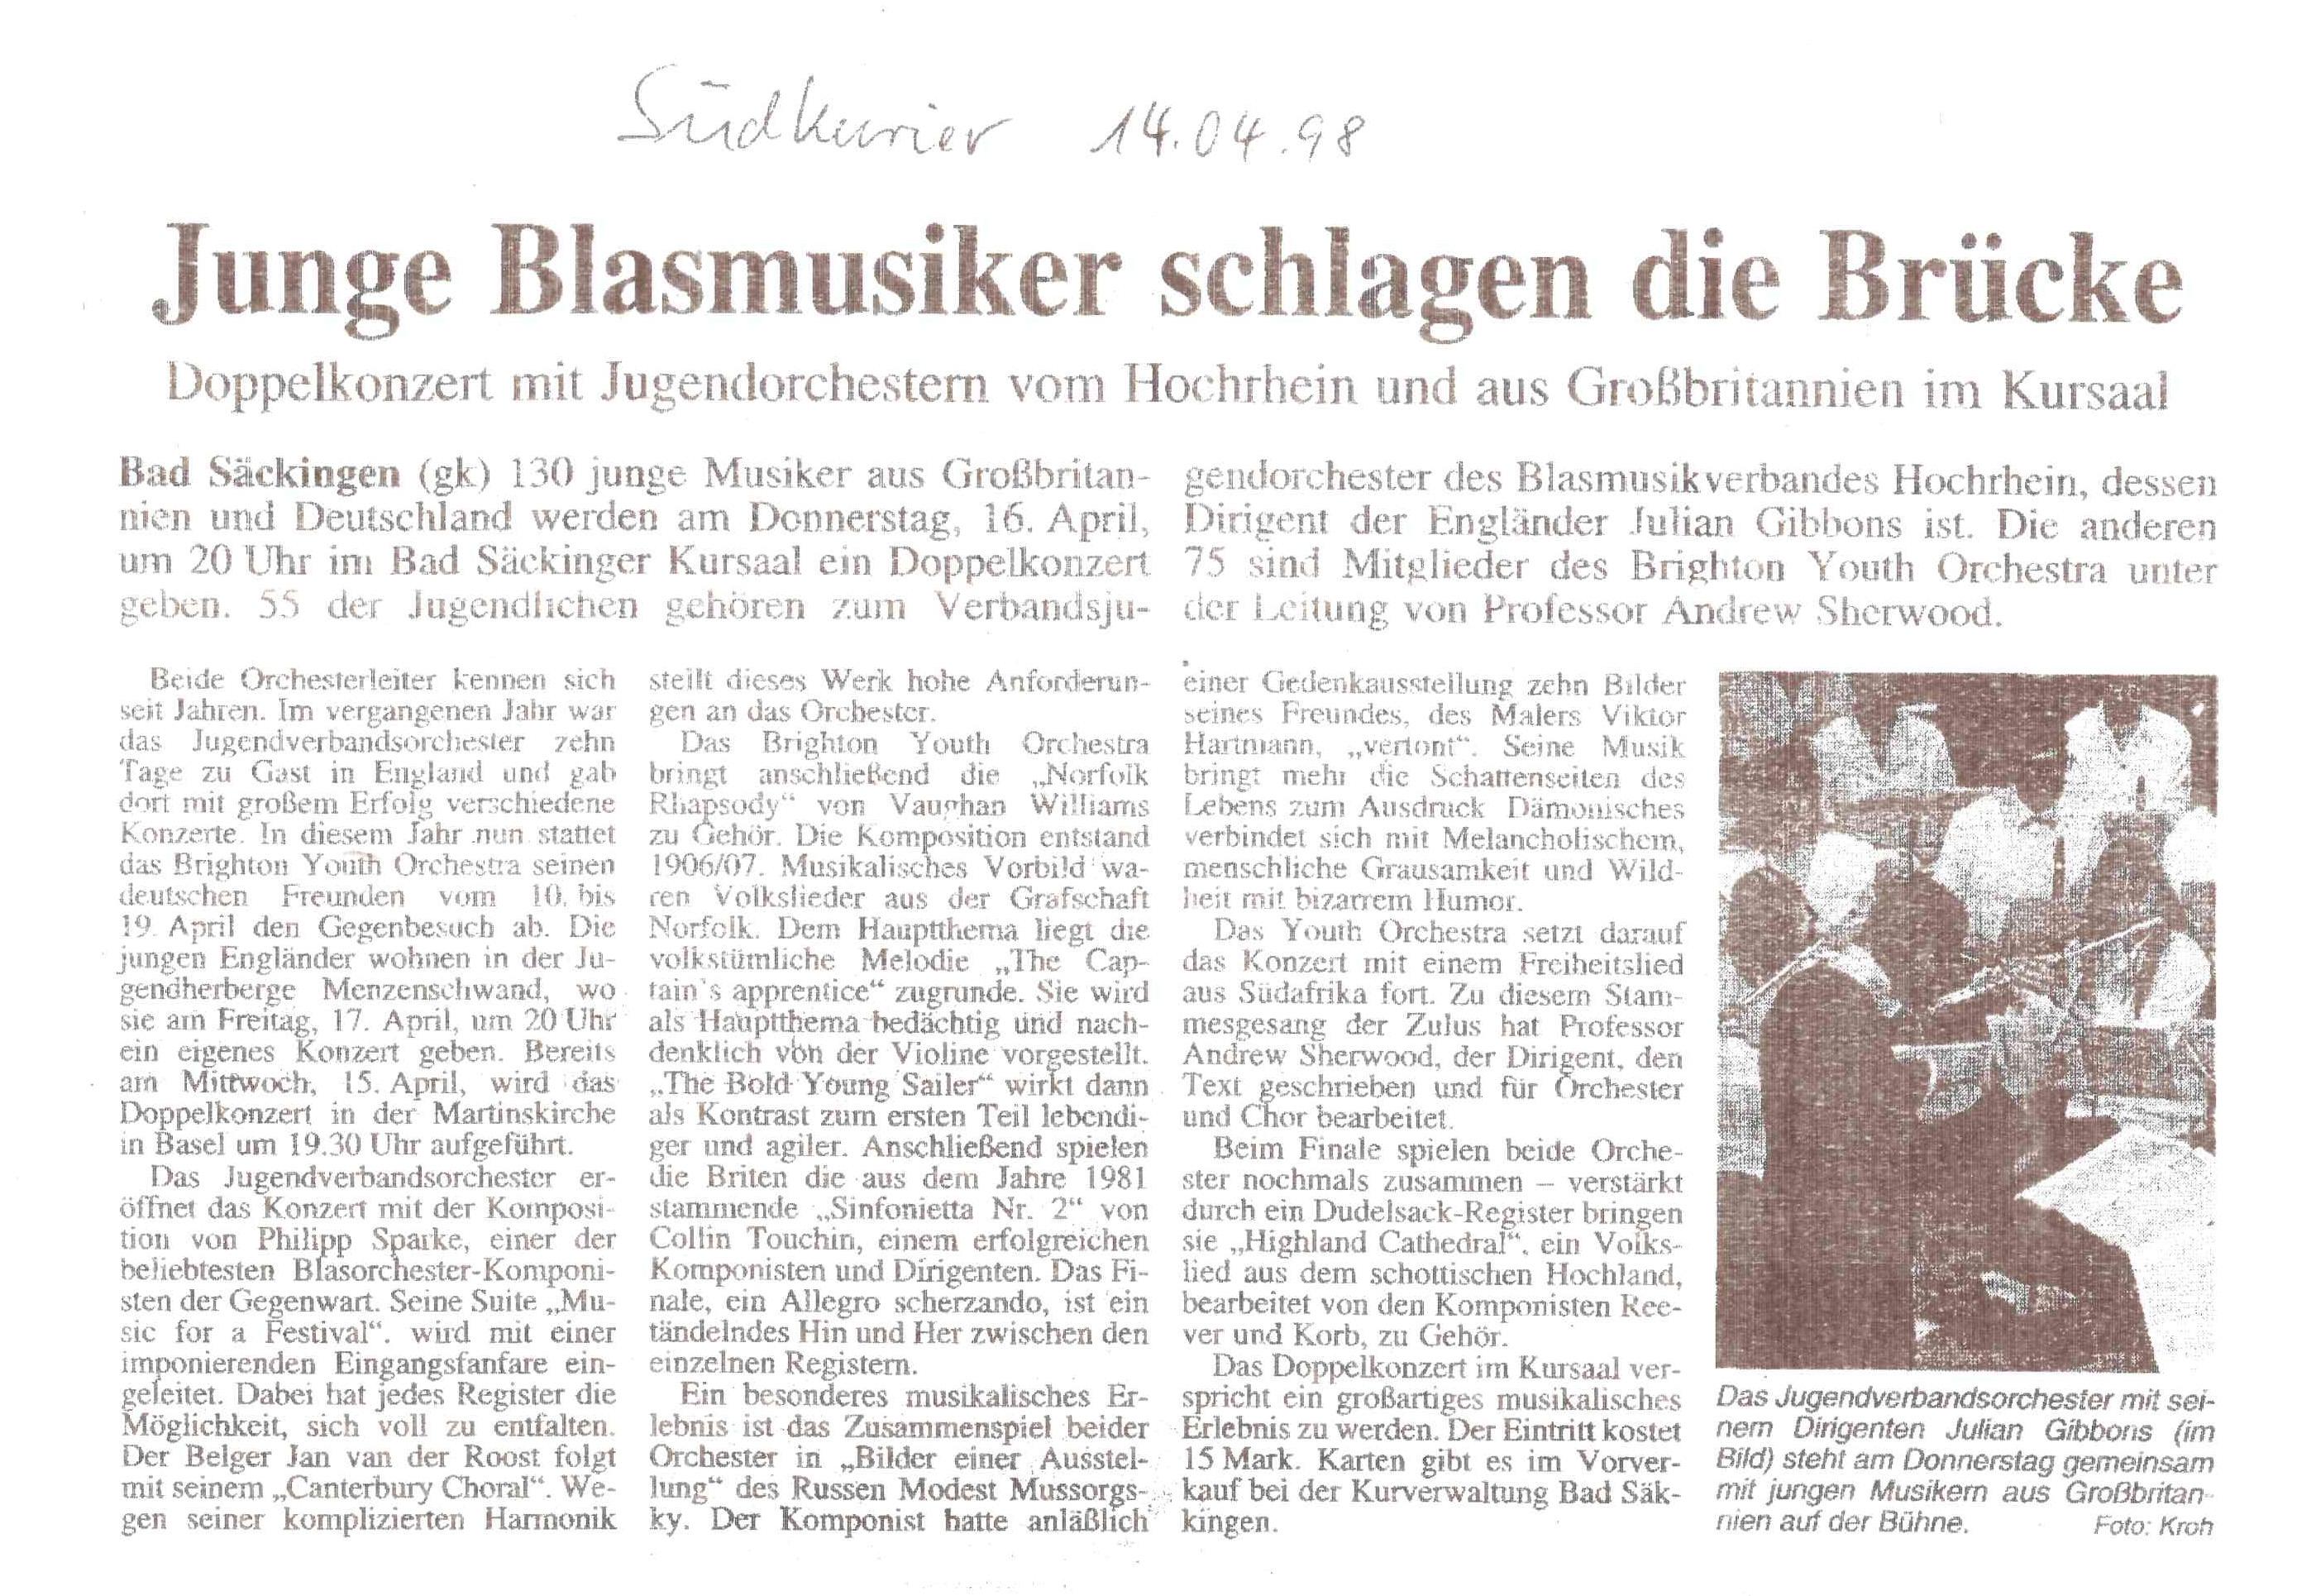 00310-Snidkurier, 14th April 1998.jpg